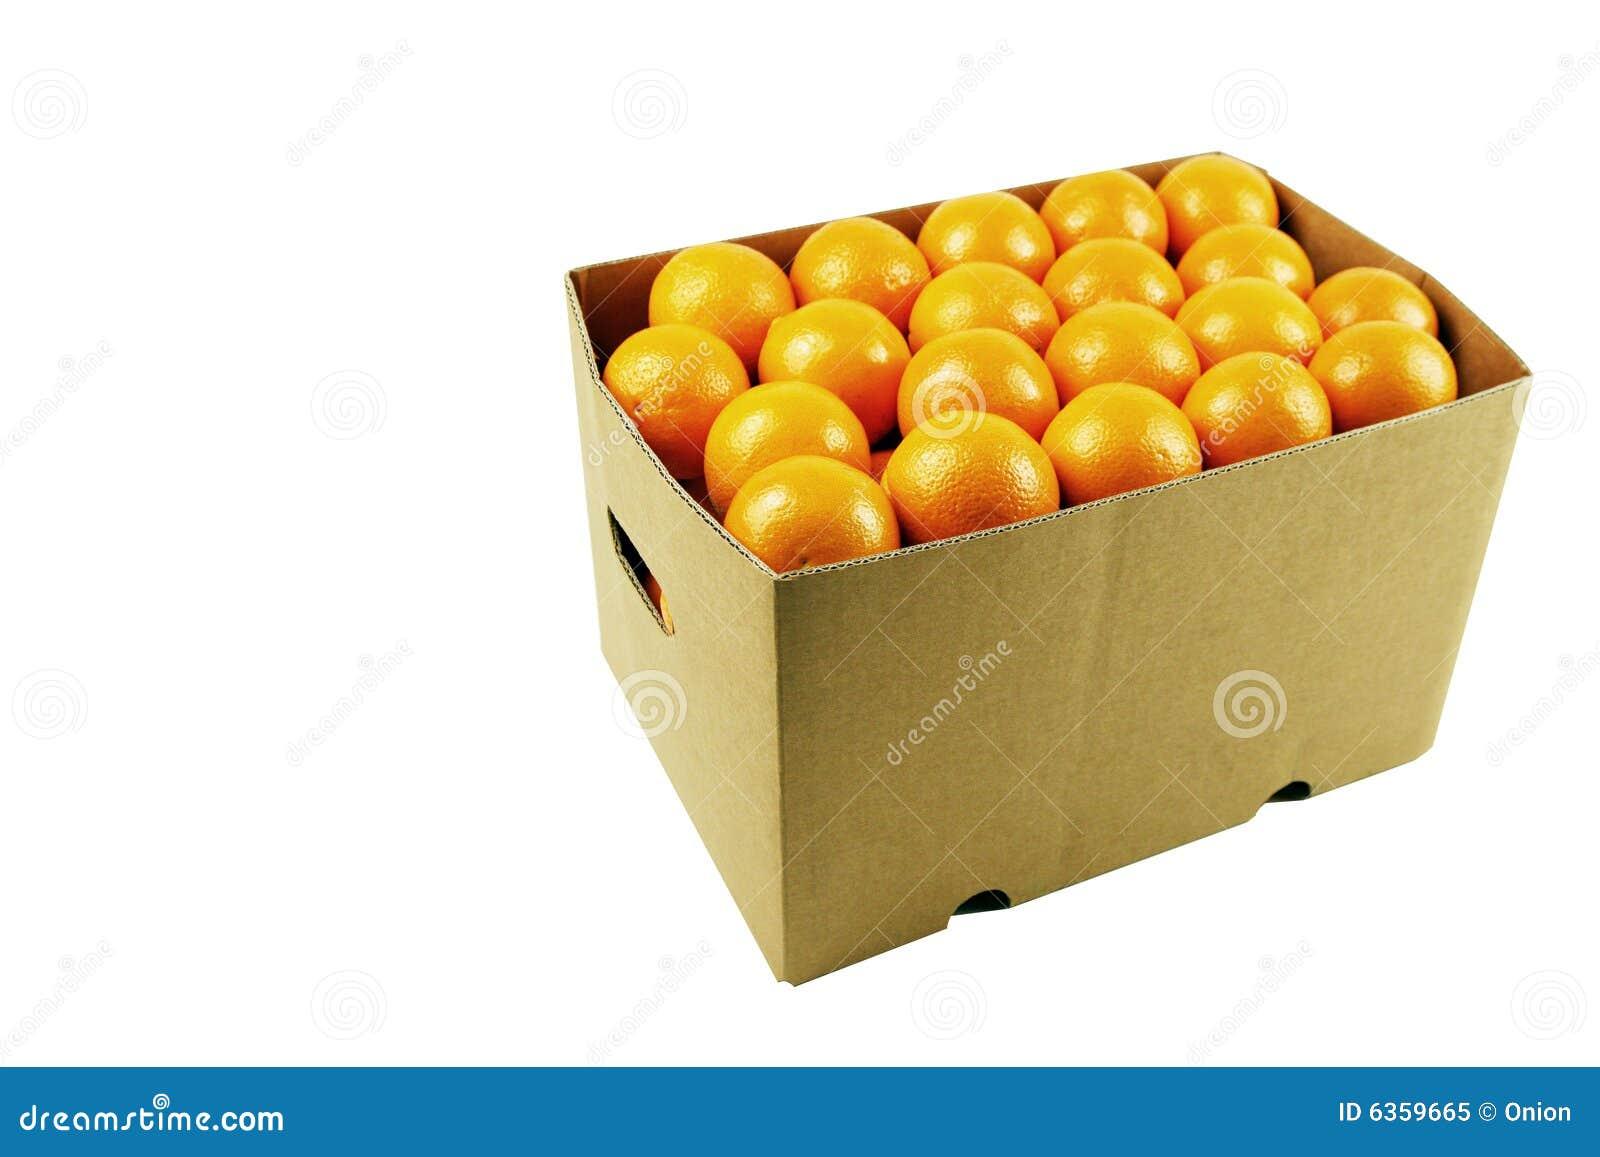 Box of juicy oranges